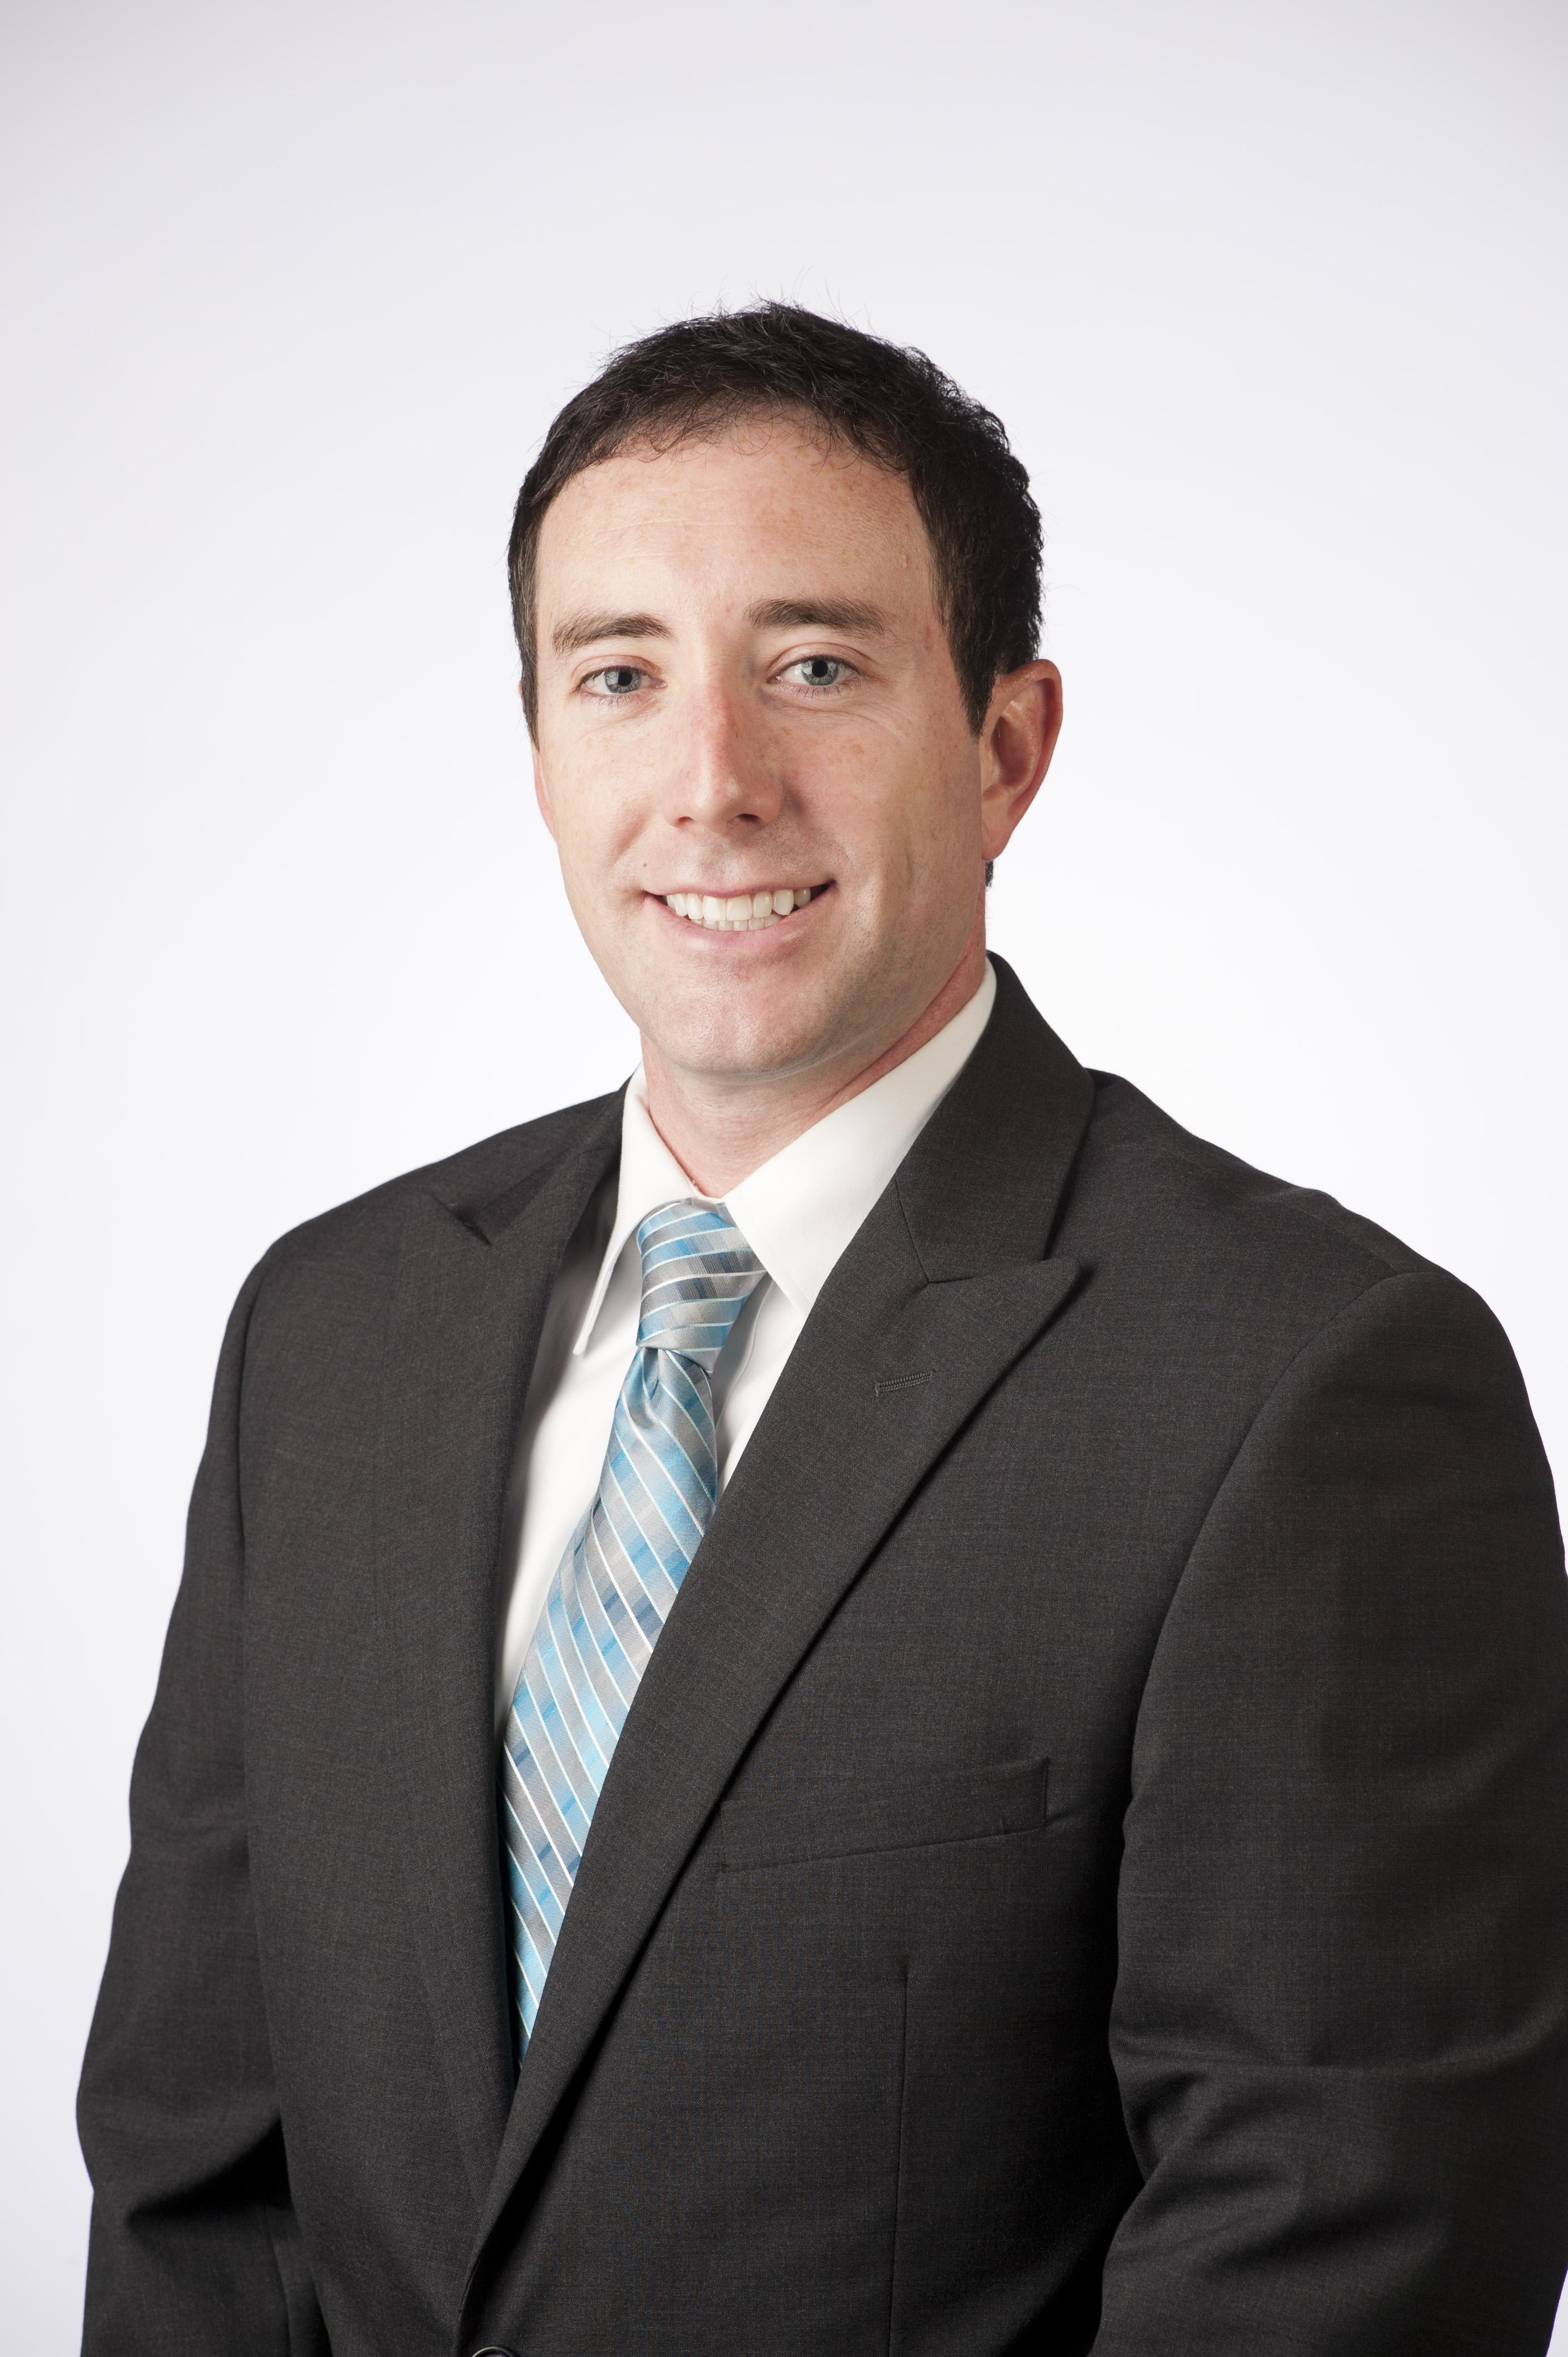 Chris M. Mattix, JD, CPA